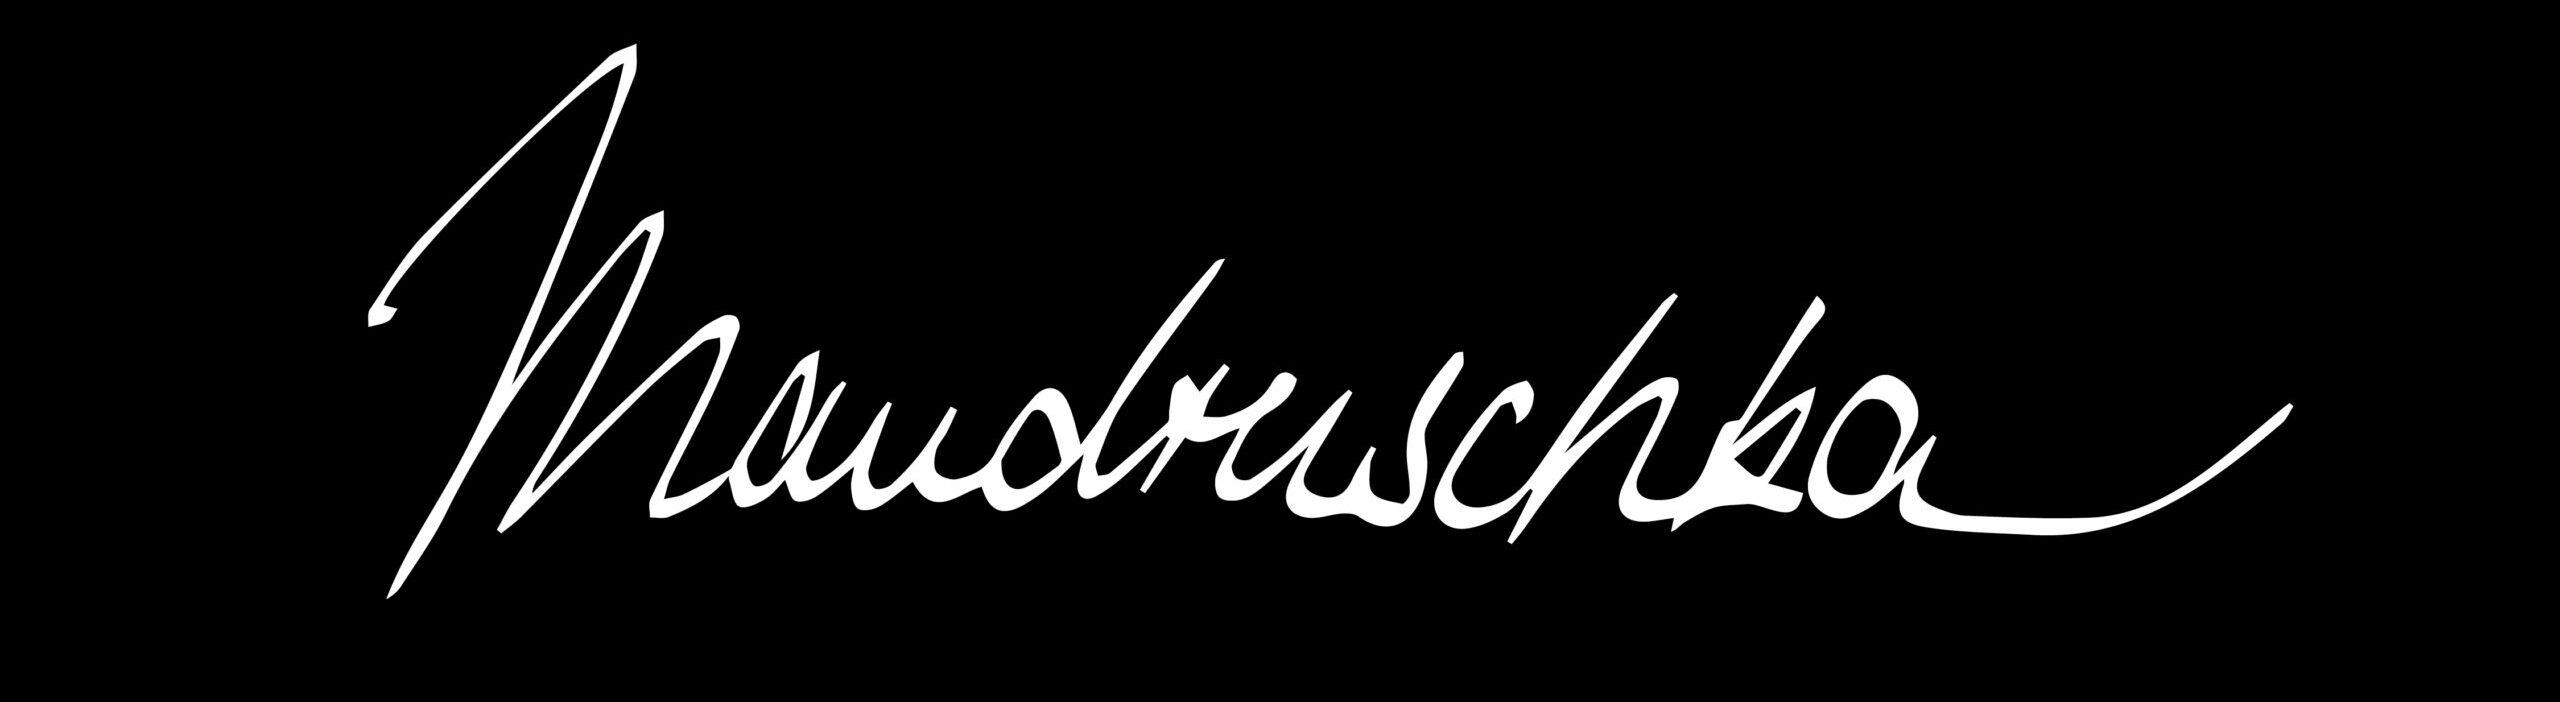 mandruschka-design.com